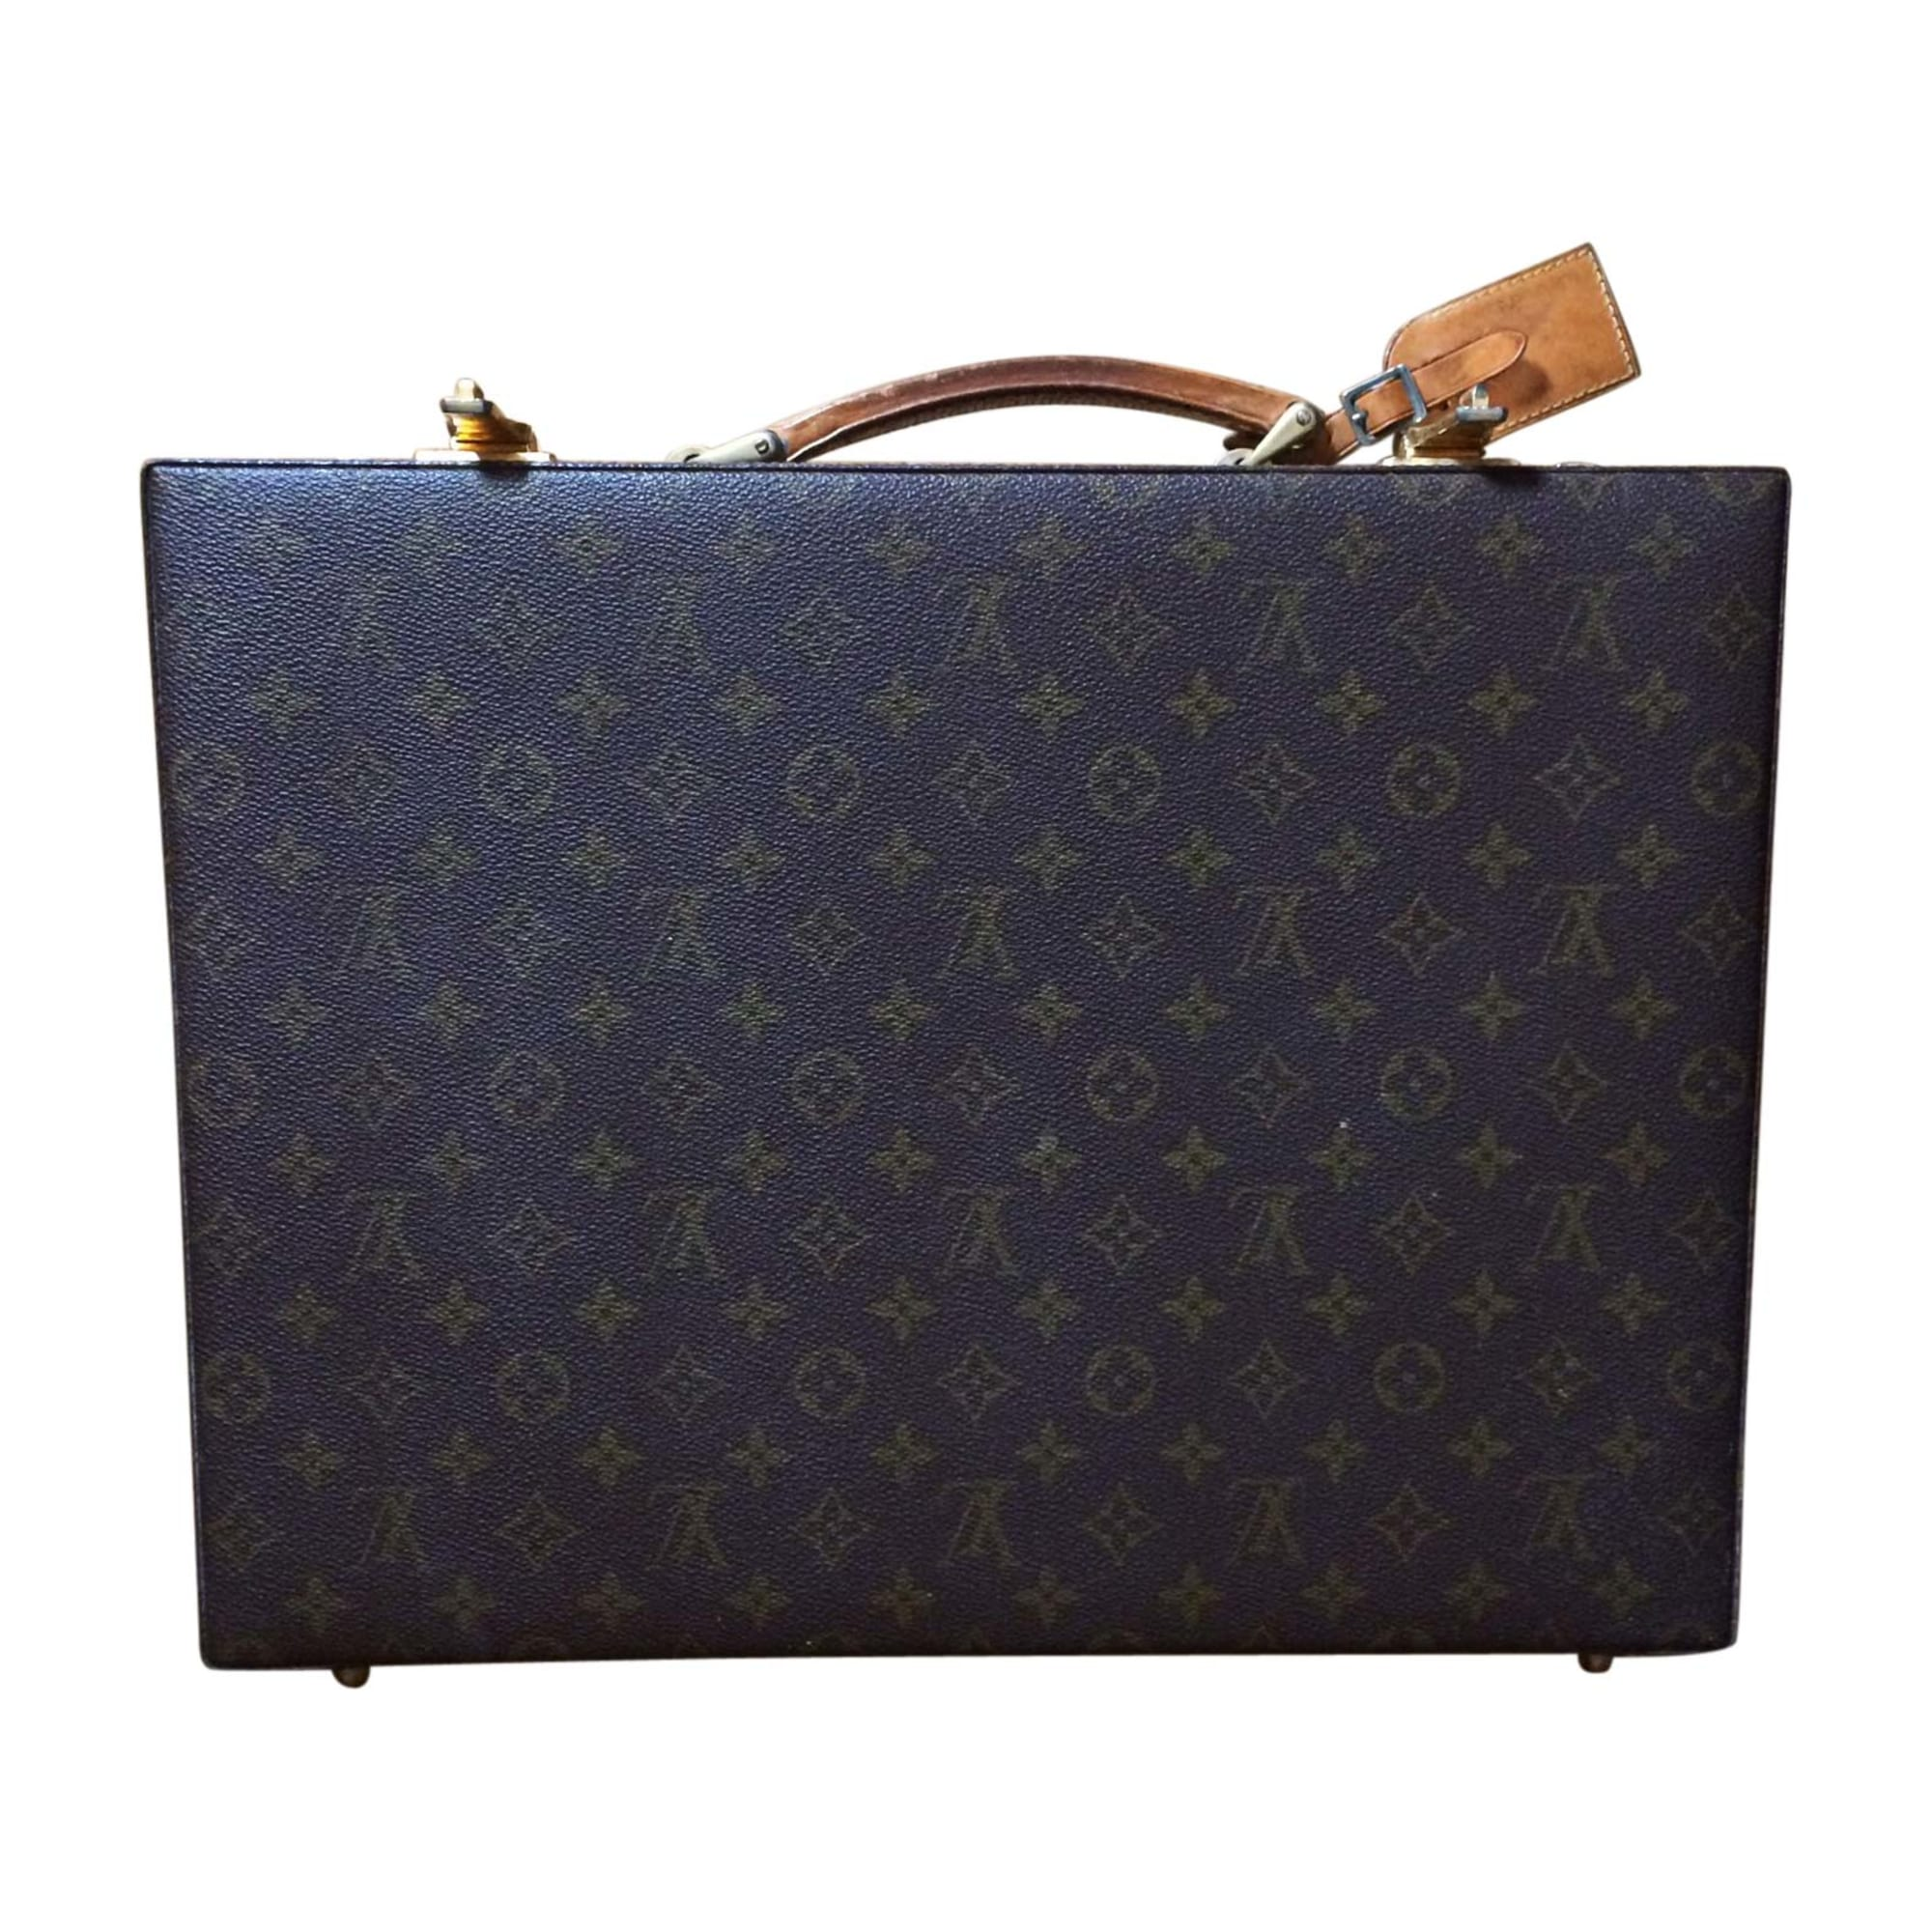 Aktenmappe, Aktentasche LOUIS VUITTON Monogramme Vuitton